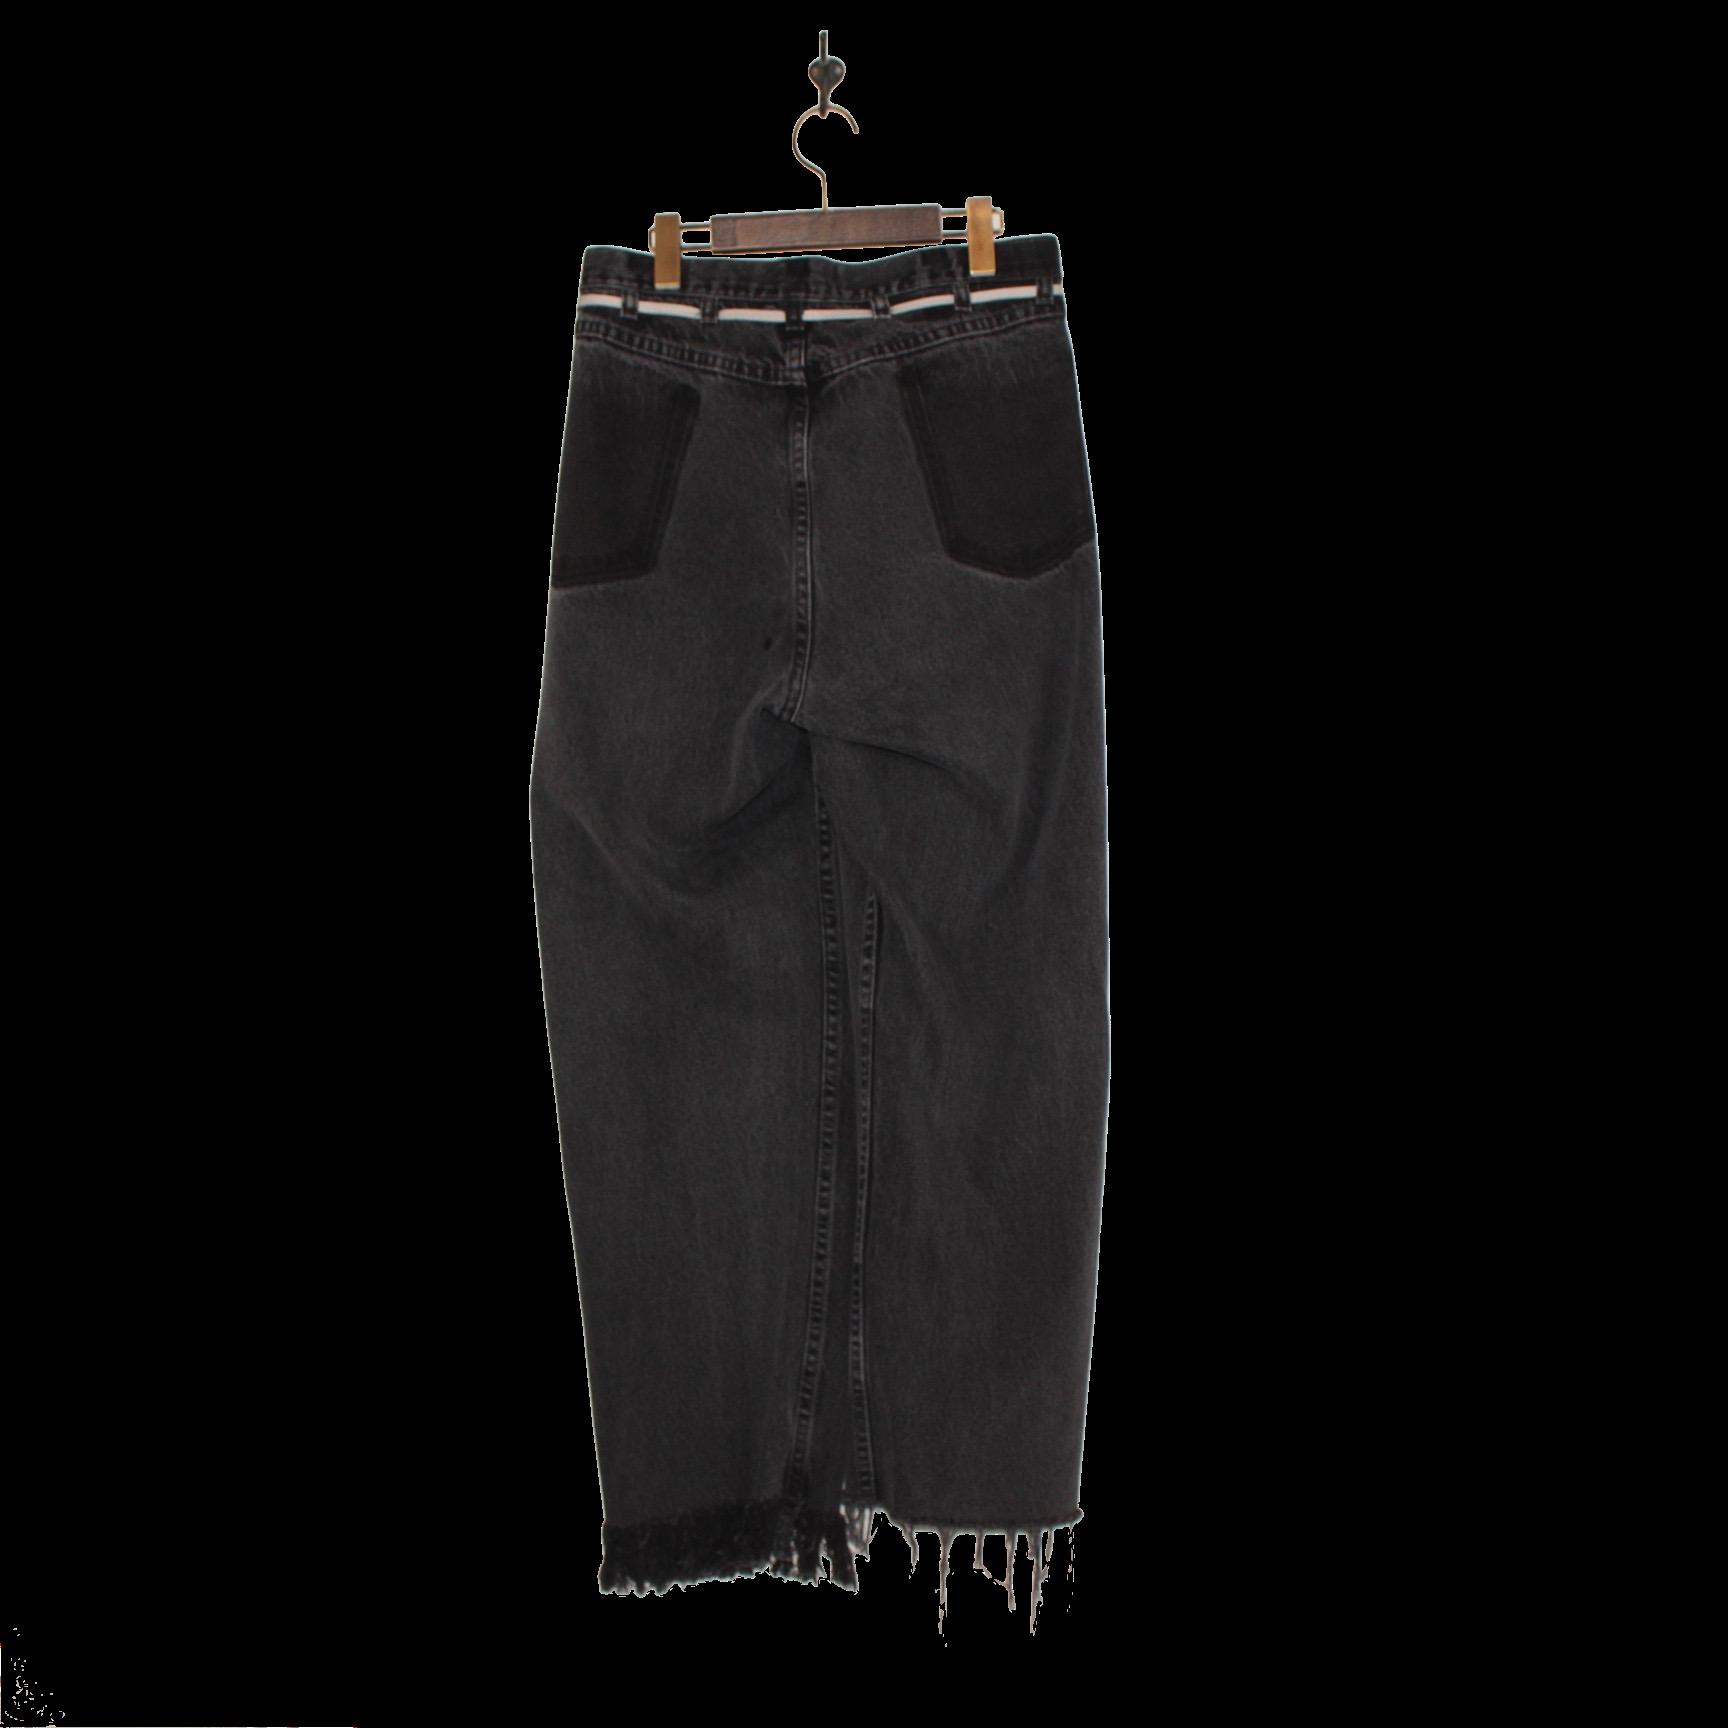 MAISON EUREKA(メゾンエウレカ)/VINTAGE REWORK BIGGY PANTS(ヴィンテージ リワーク ビギー パンツ)-BLACK